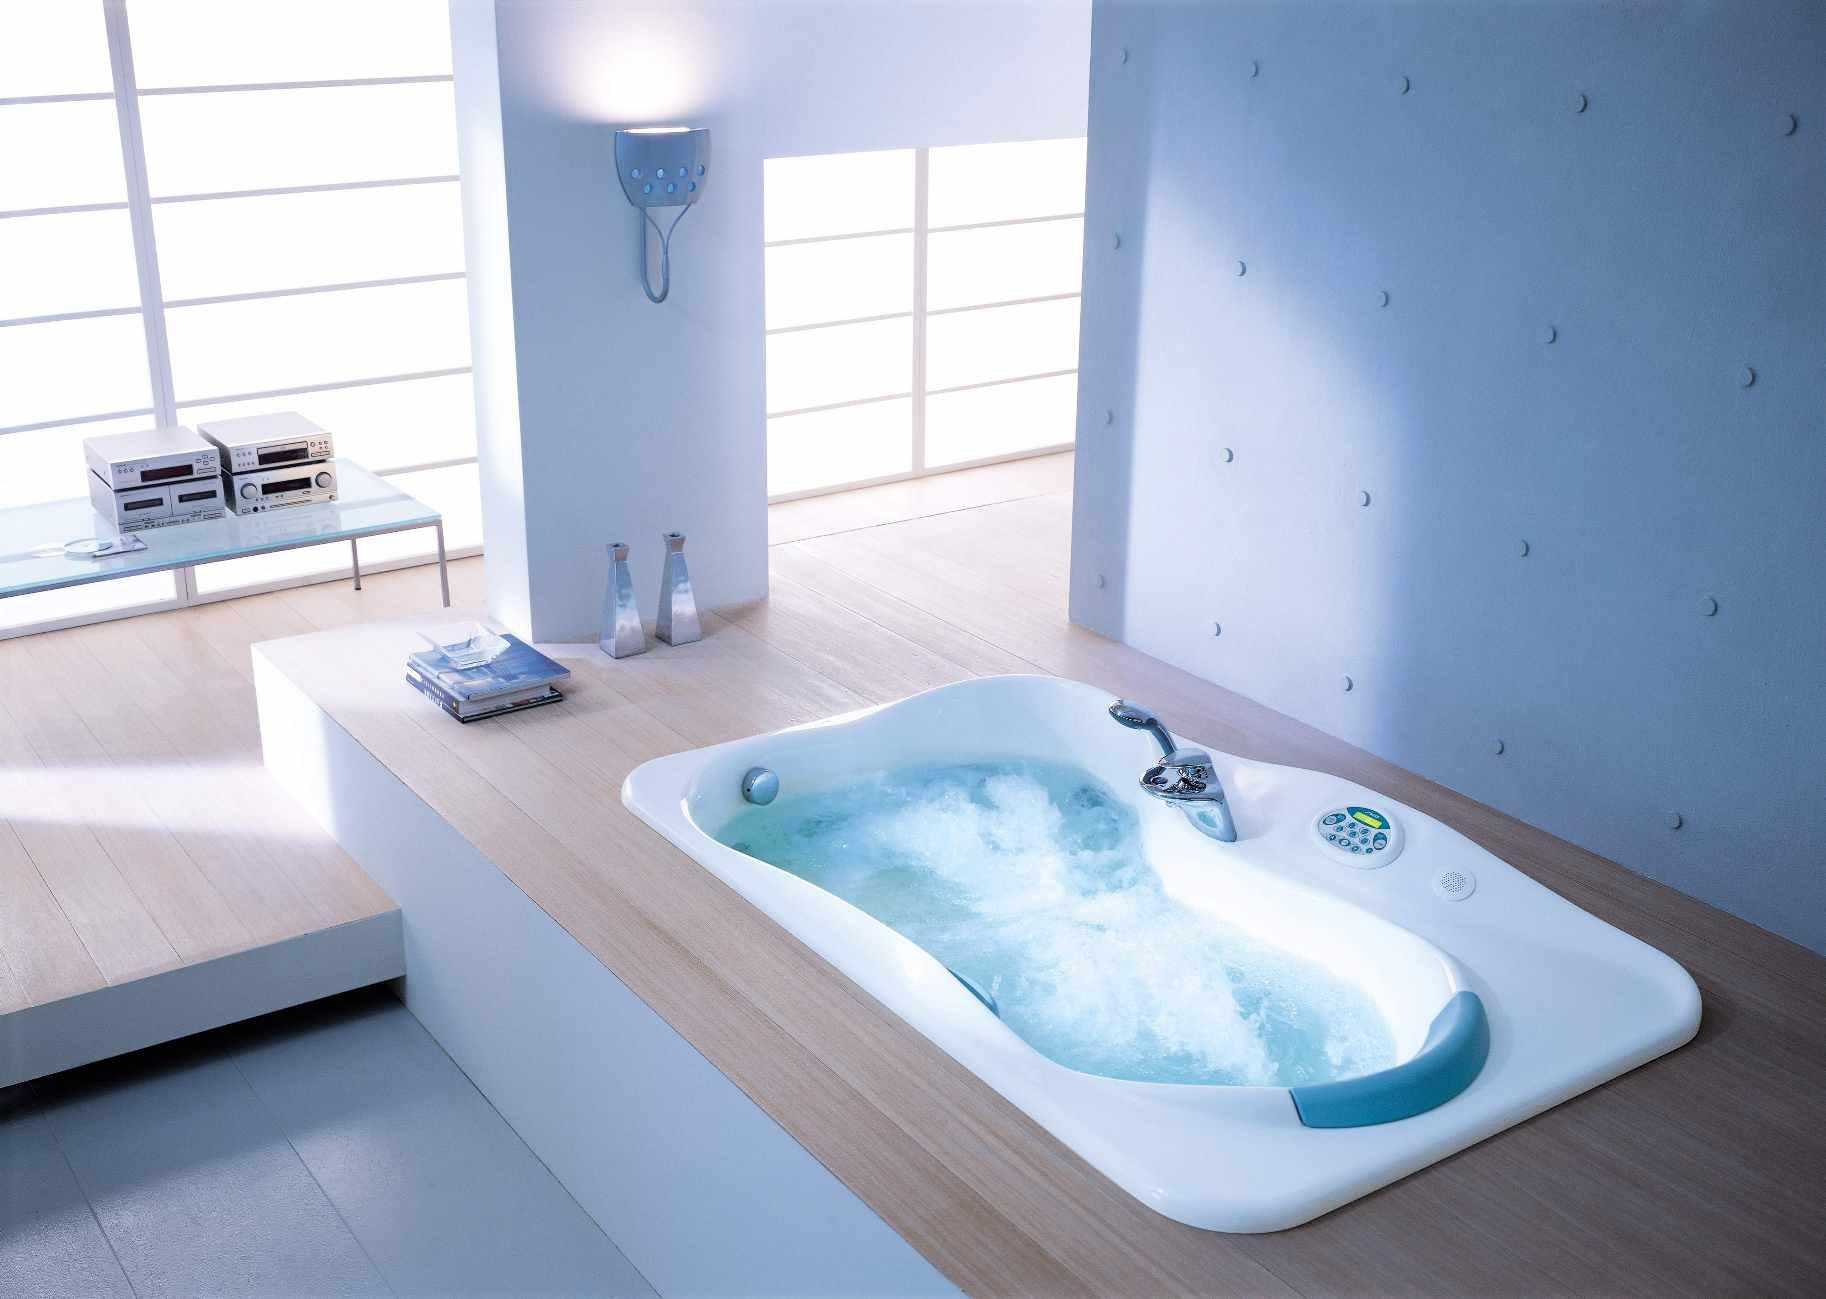 Vasca idromassaggio - Hotel